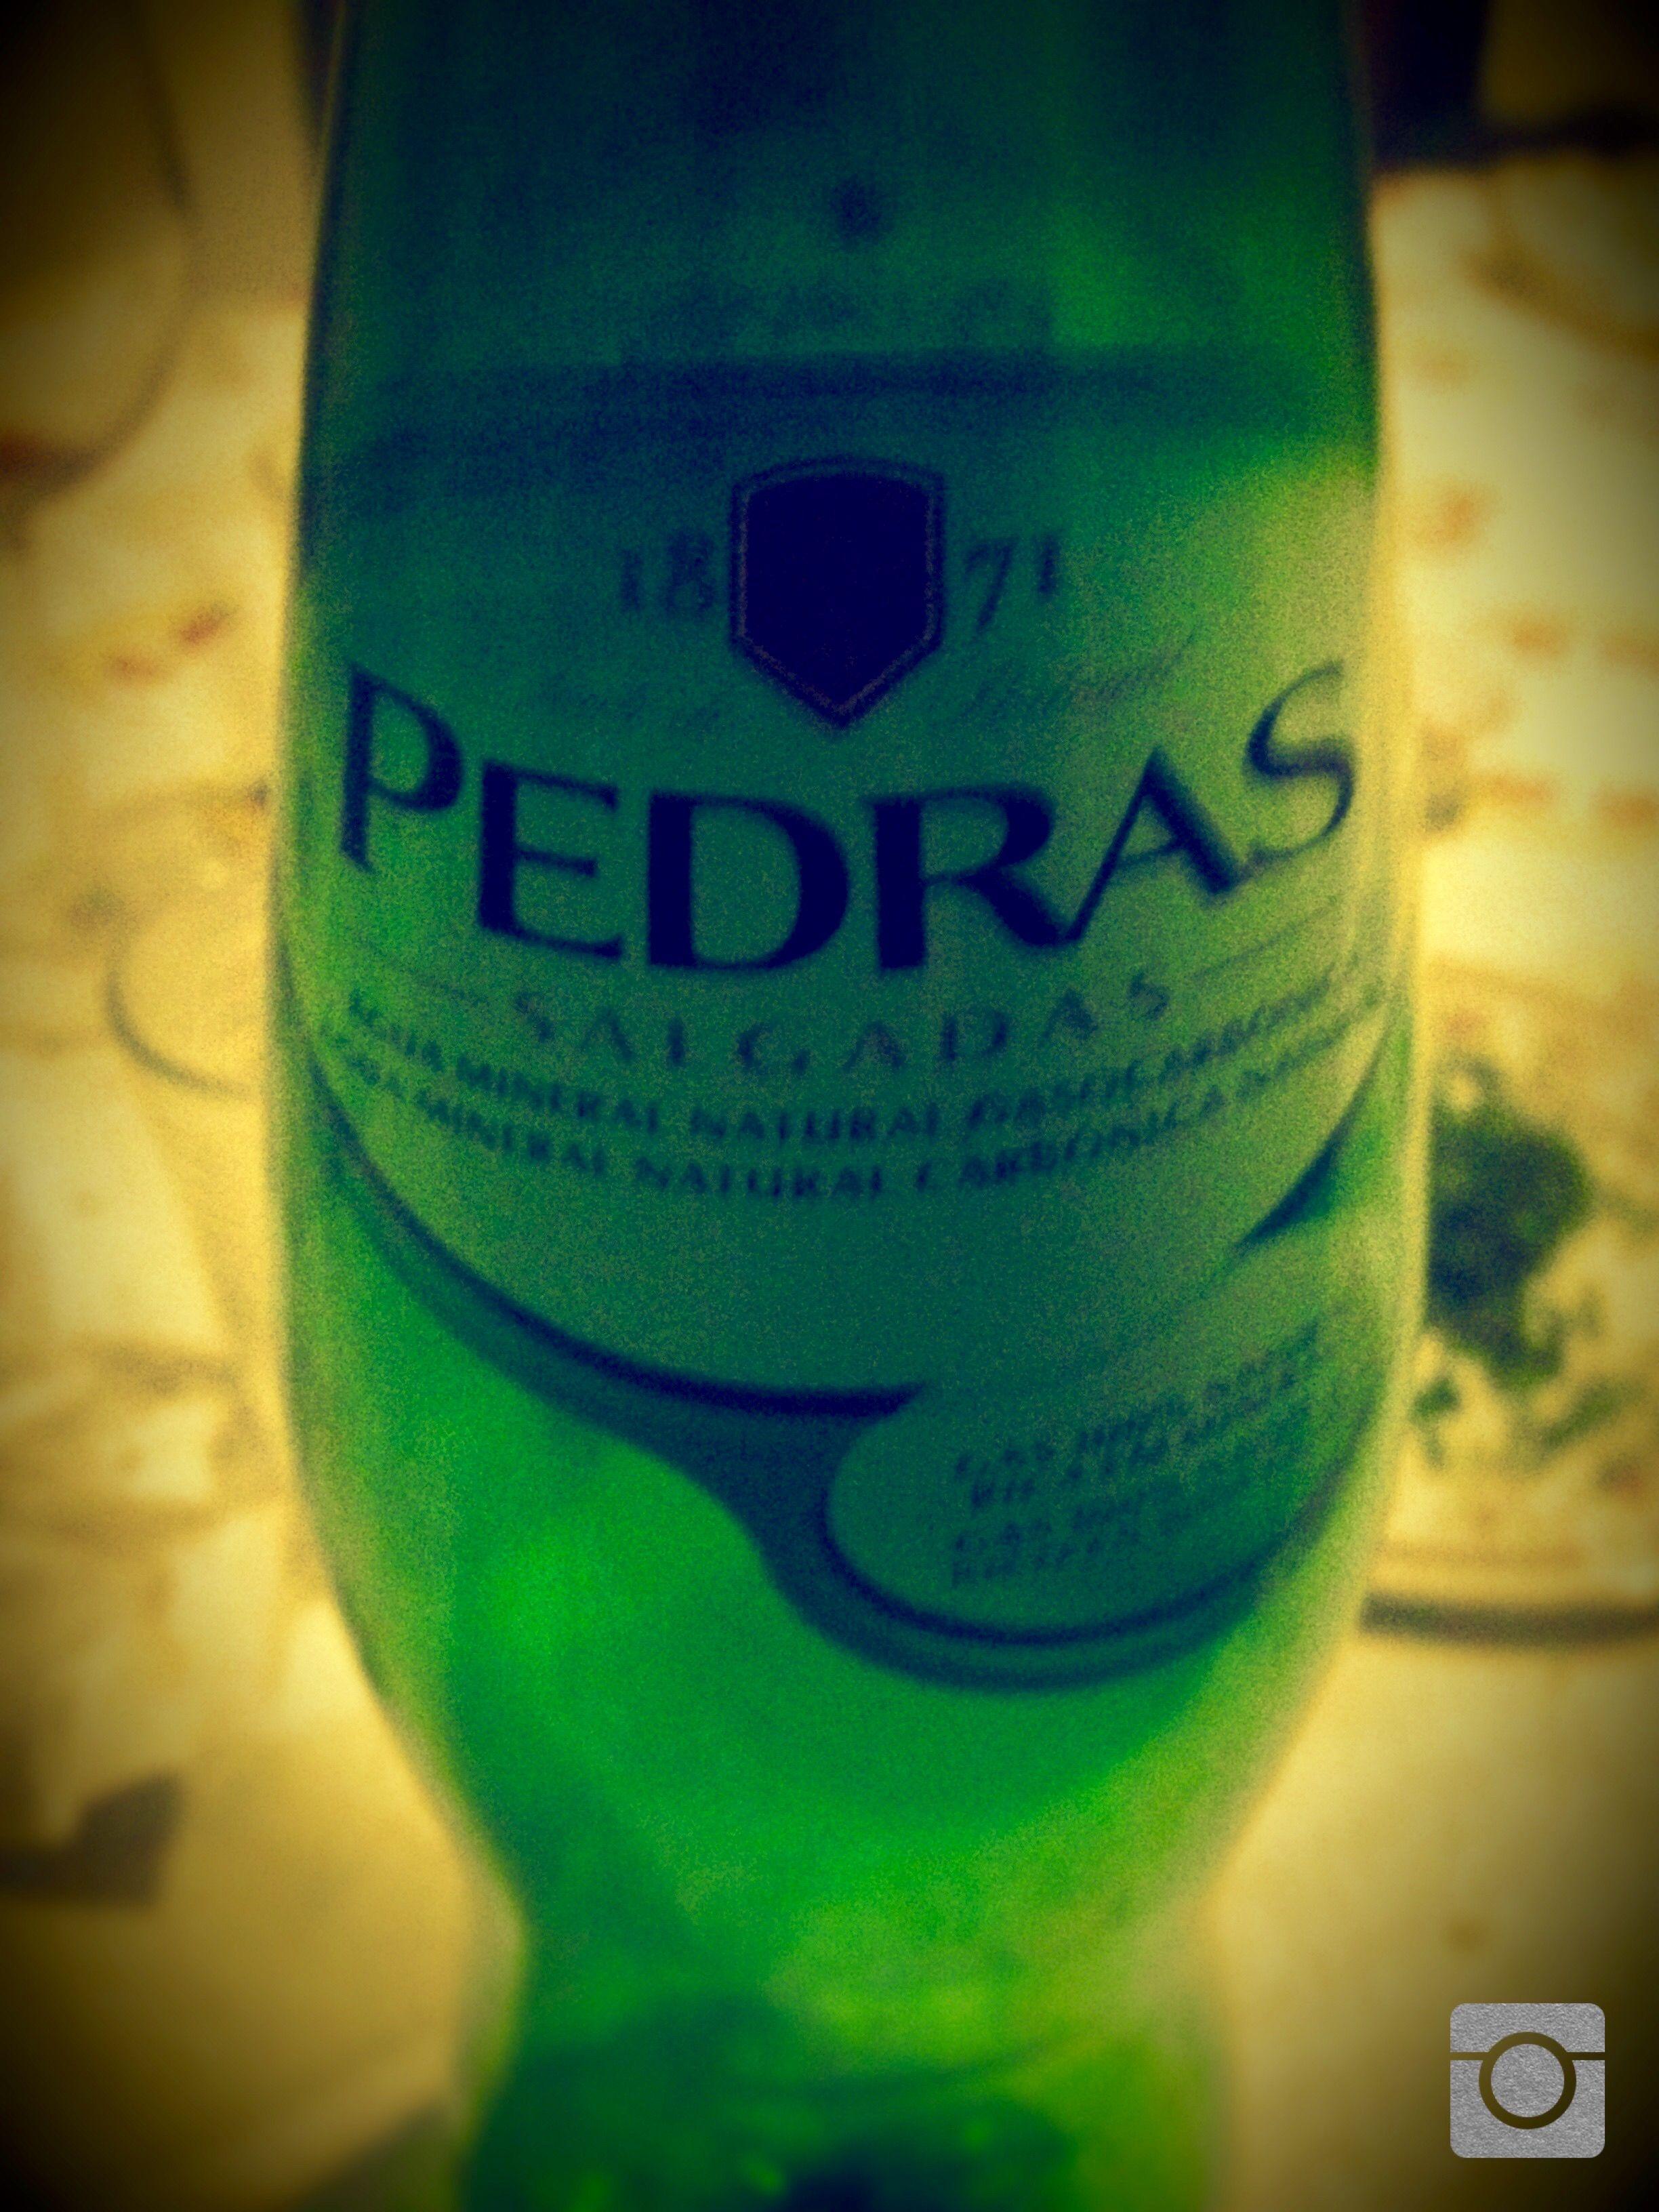 Água das Pedras sempre presente nos wine & dinne & wine & lunch